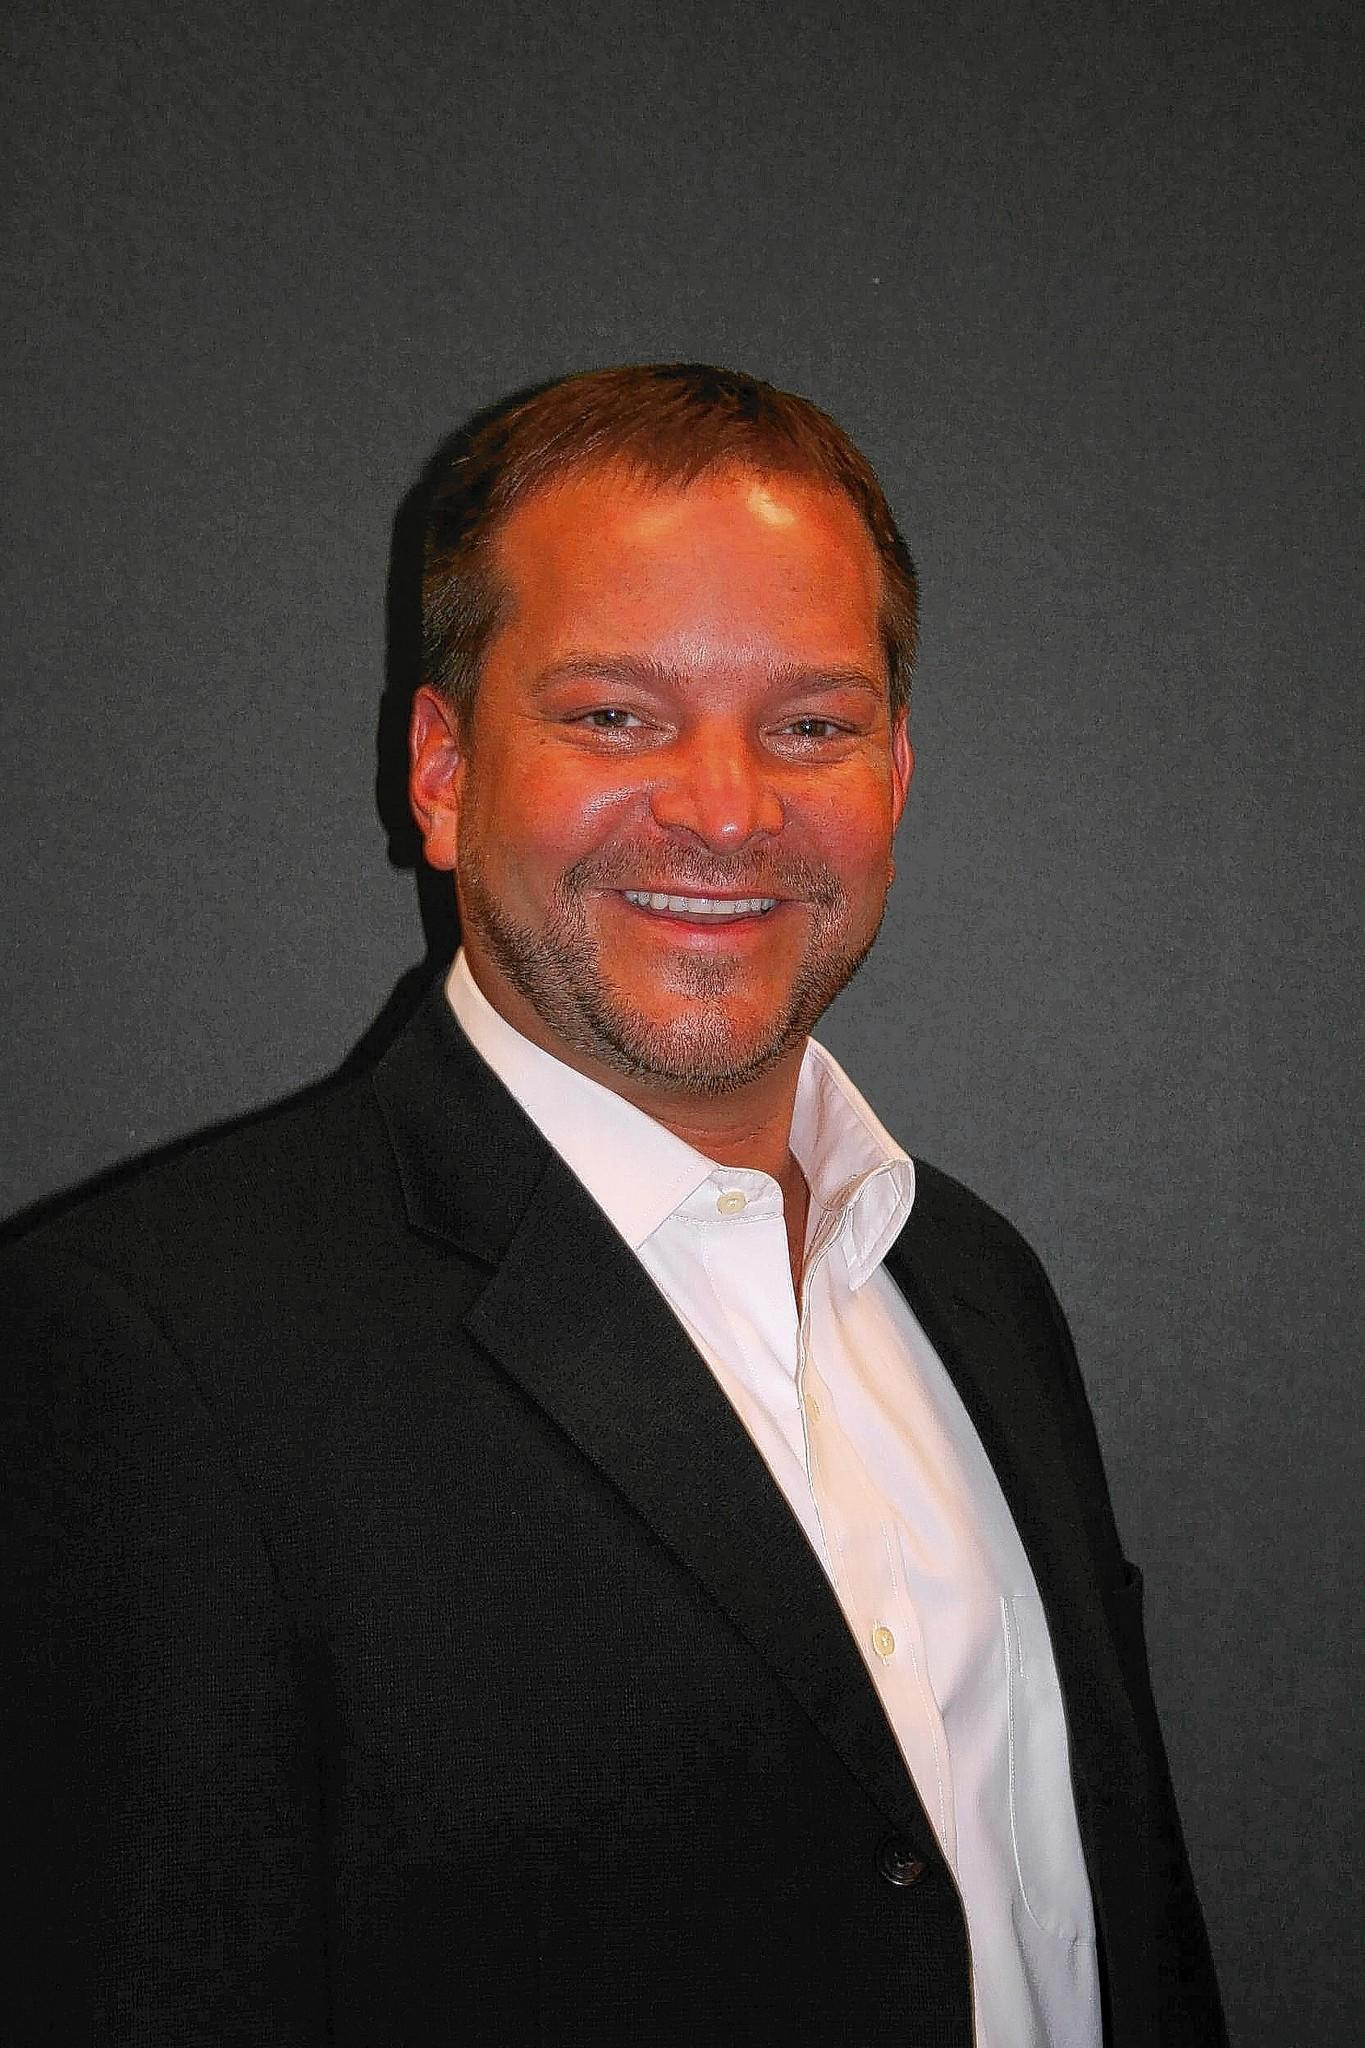 Ron Legler succeeds Jeff Daniel as head of the Hippodrome Theatre.